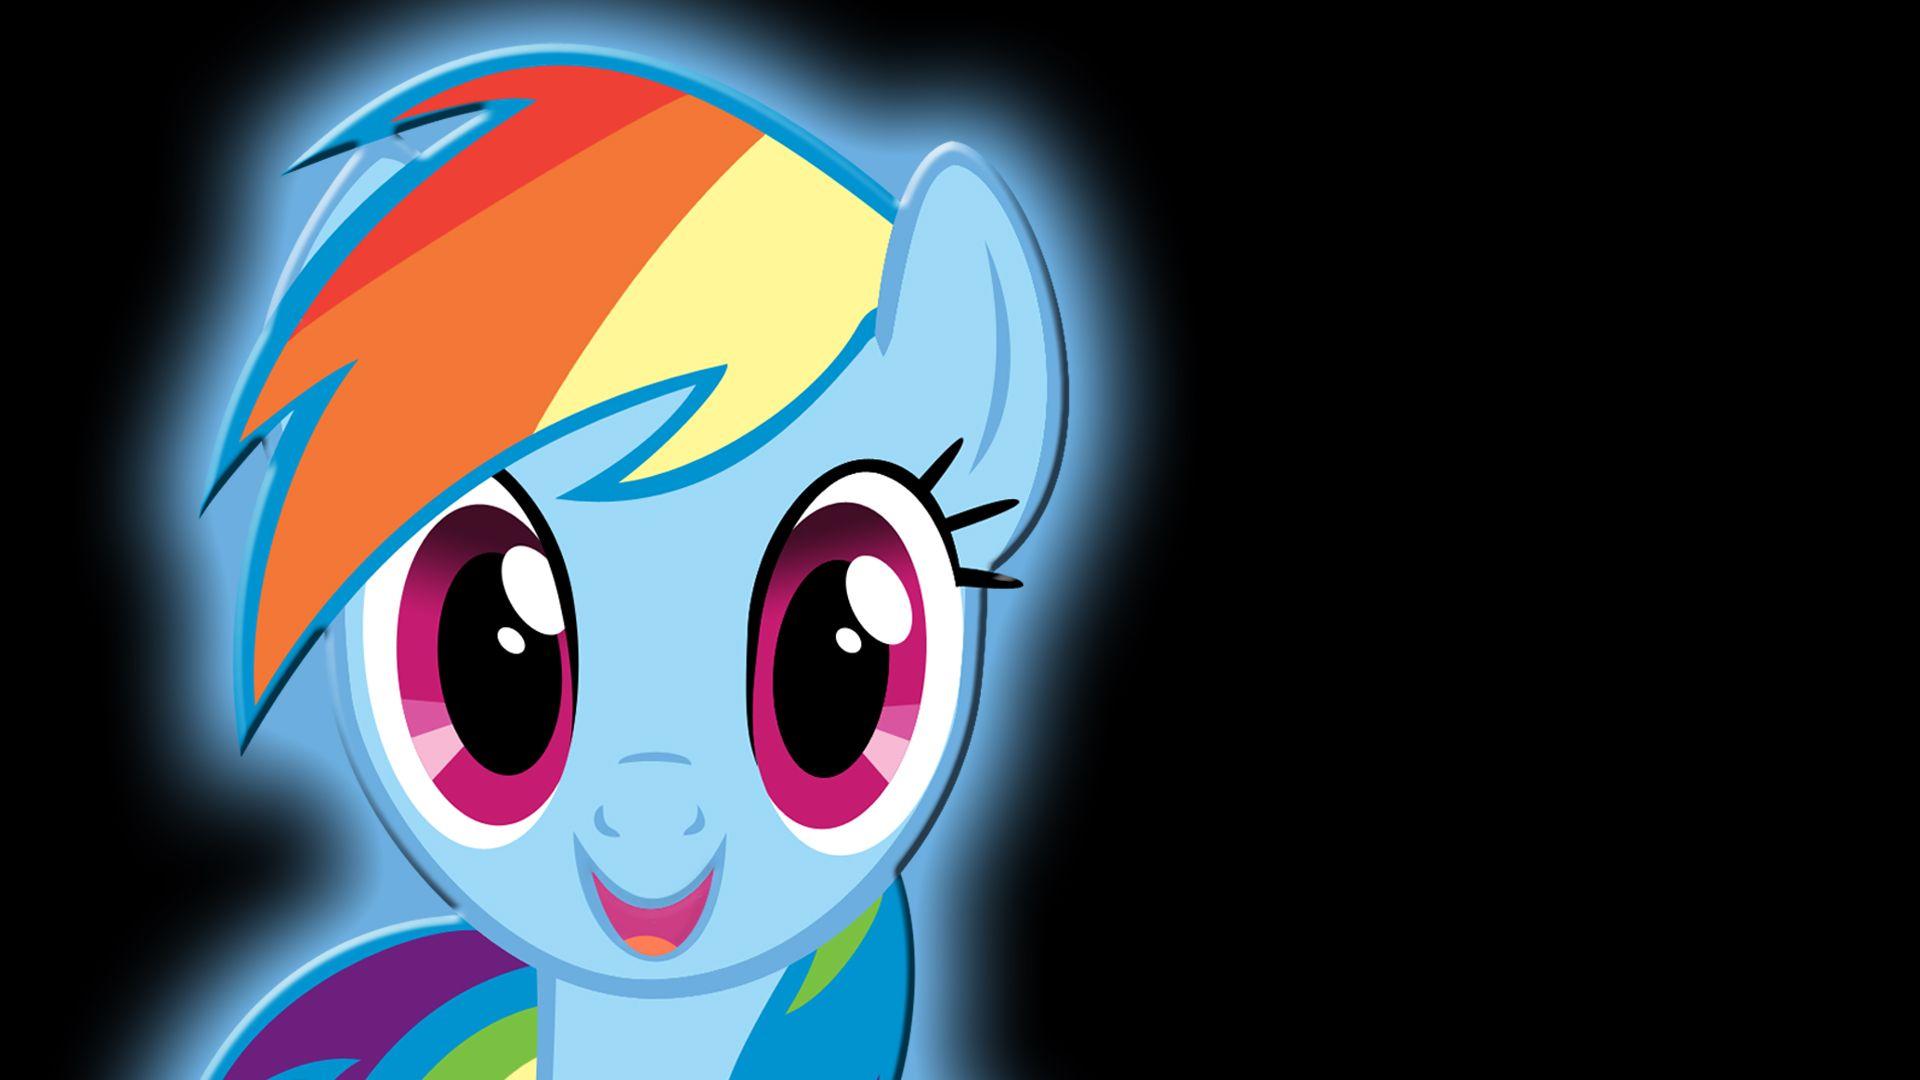 Rainbow Dash Background Wallpaper Walldevil Best Free Hd